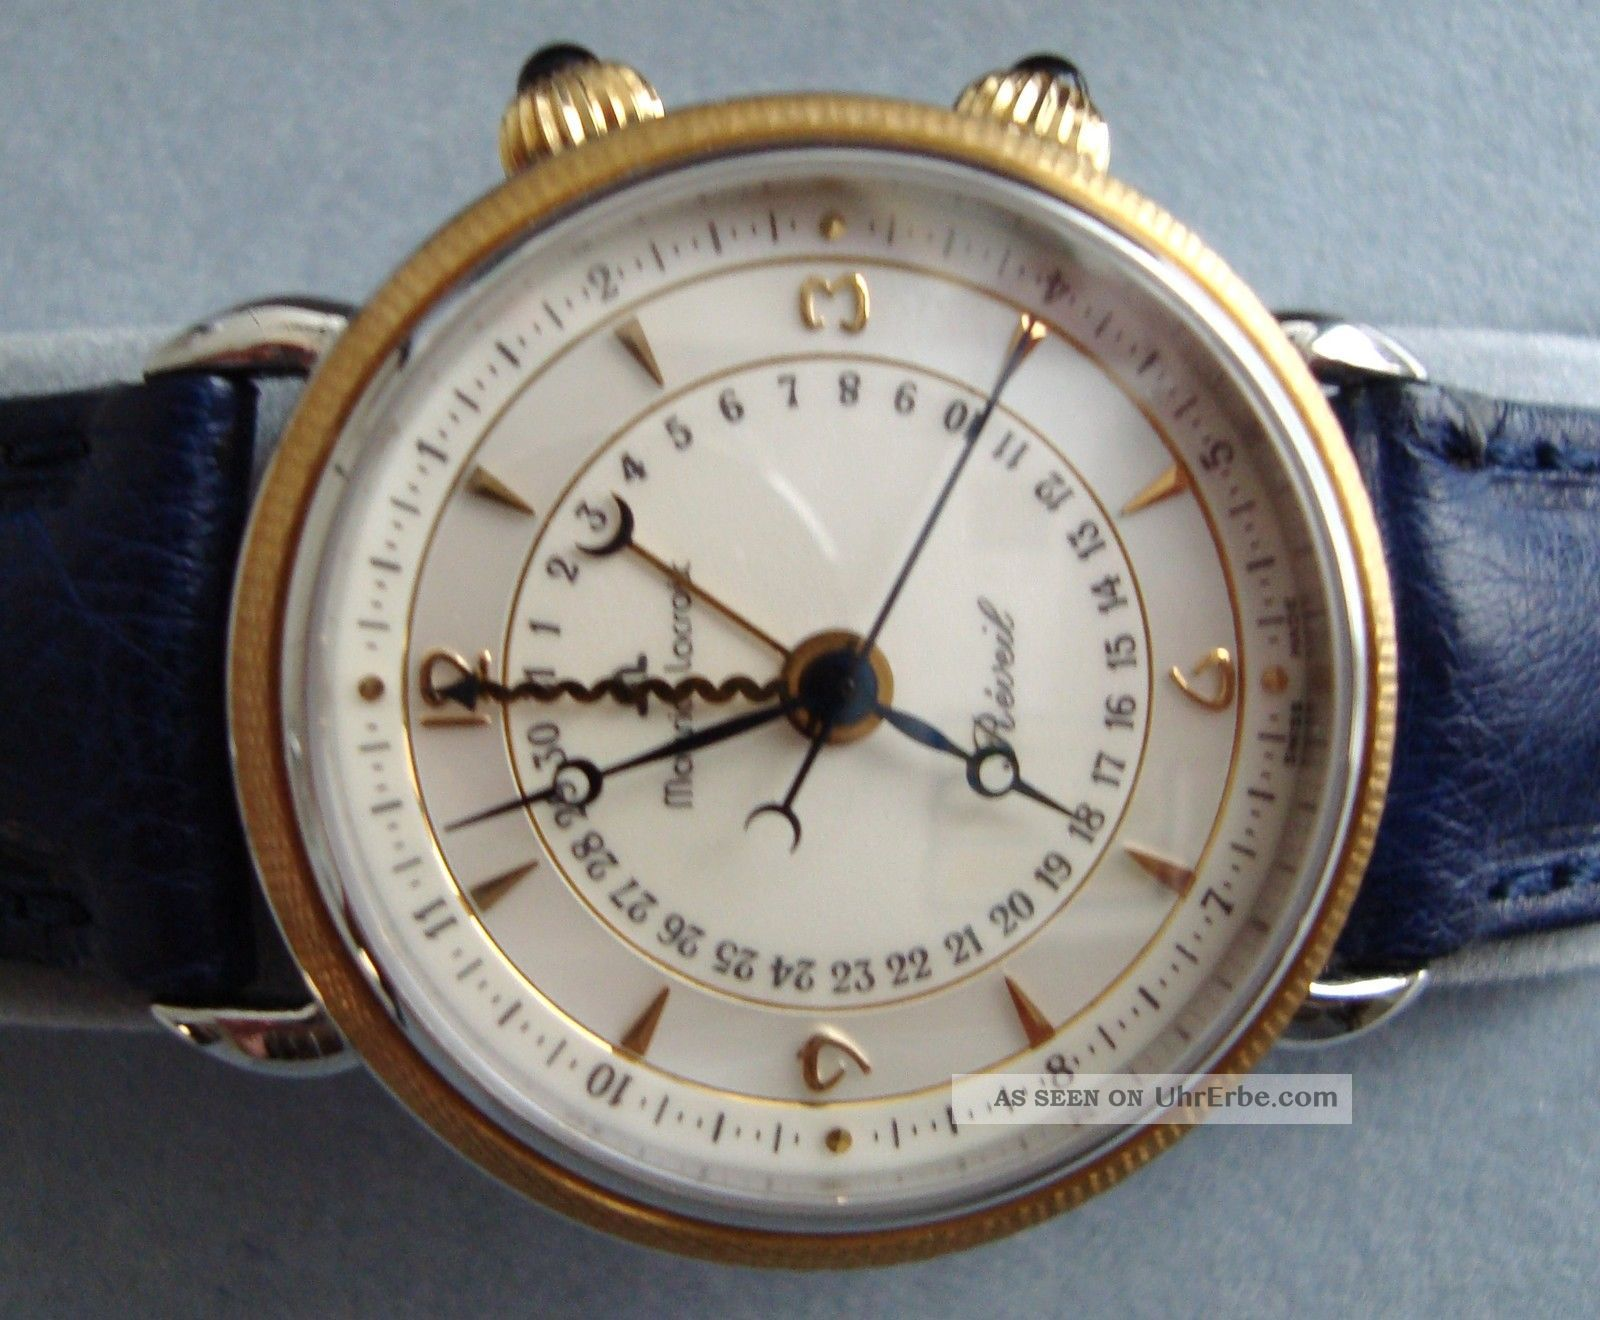 Maurice Lacroix Masterpiece Reveil 18k Gold Ref 63511,  Ovp,  S.  G.  E Armbanduhren Bild